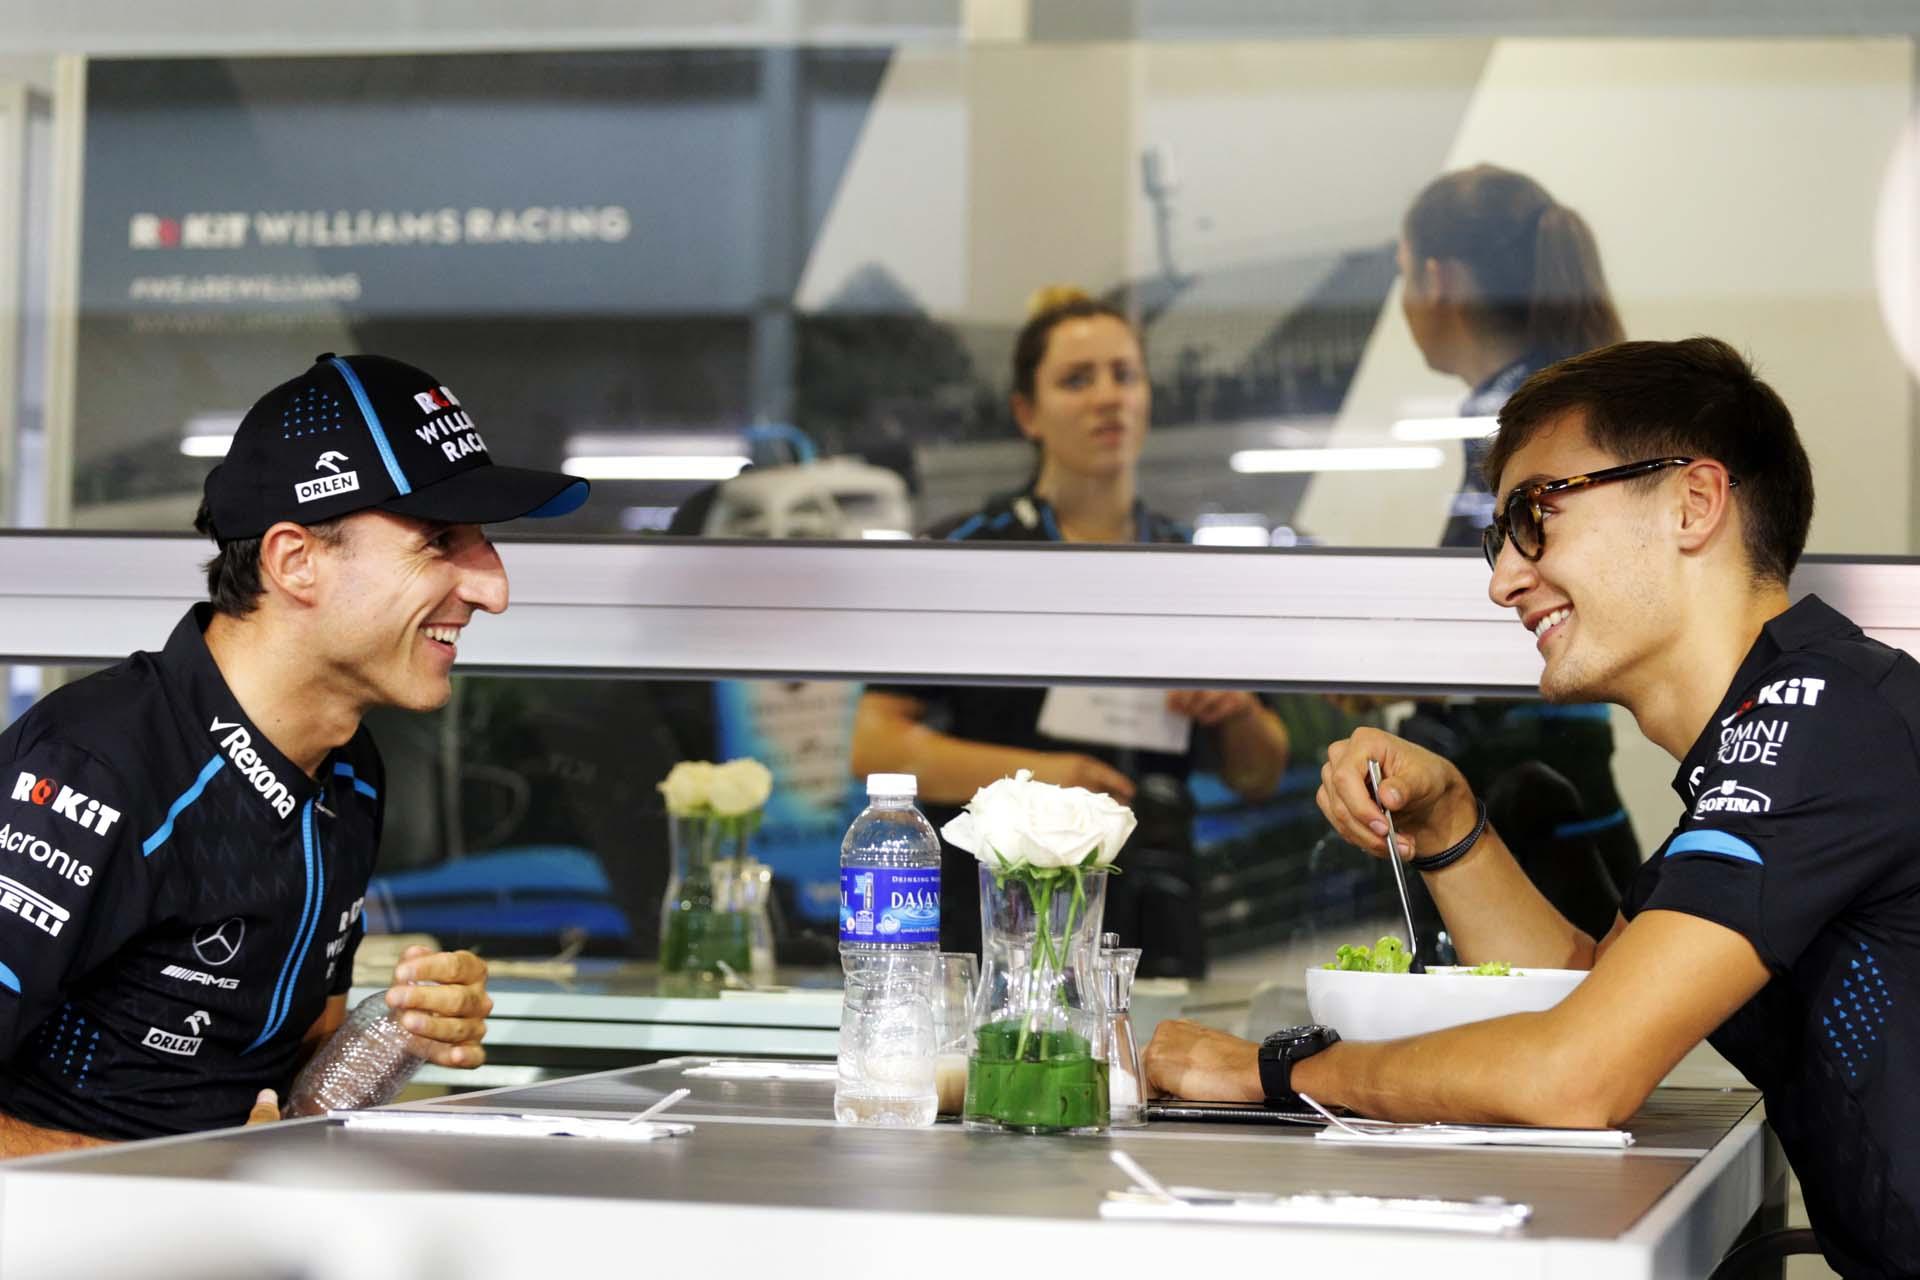 Motor Racing - Formula One World Championship - Singapore Grand Prix - Preparation Day - Singapore, Singapore